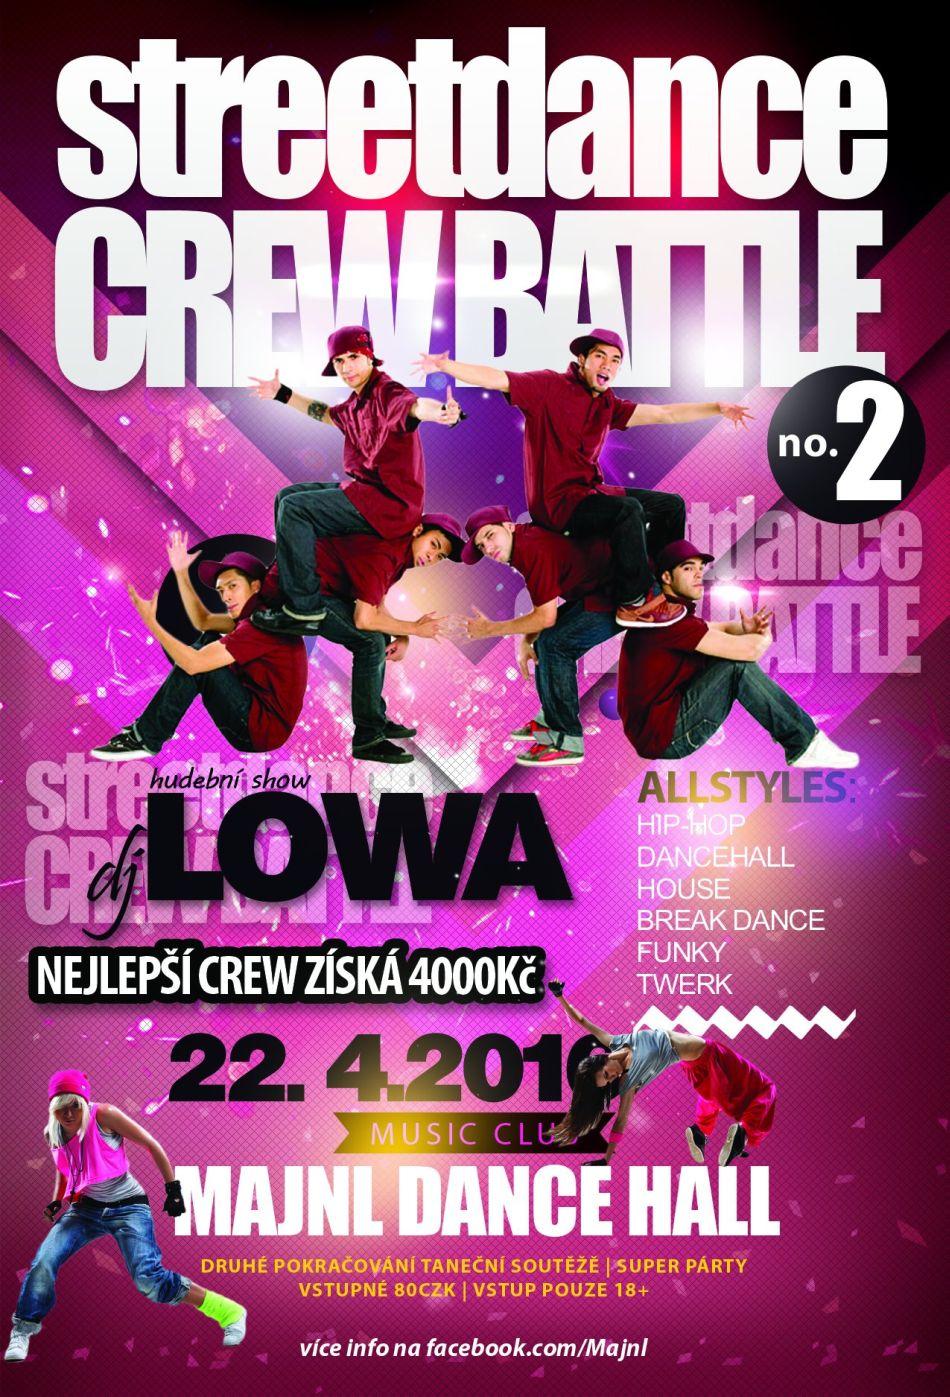 Streetdance Crew Battle no. 2 | Majnl Dance Hall